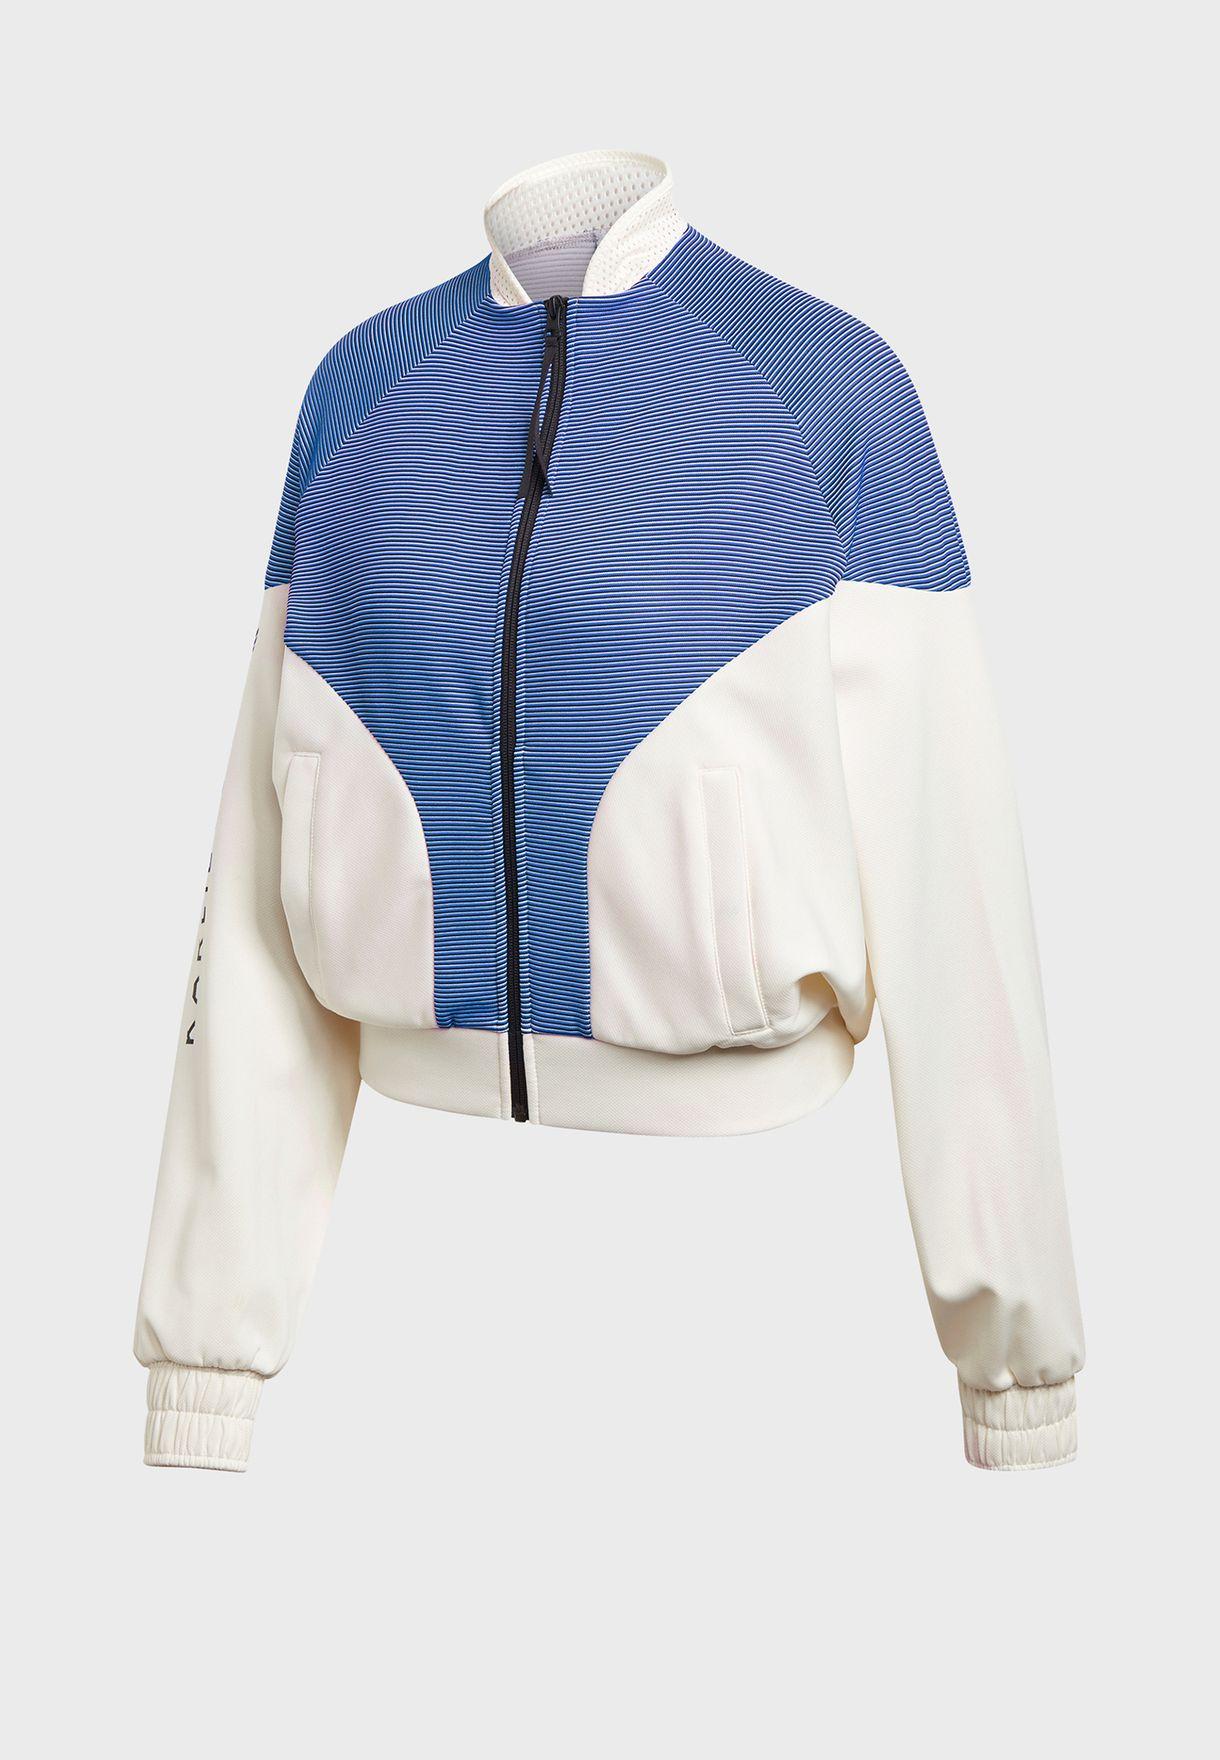 Karlie Kloss Colour Block Cover Up Jacket